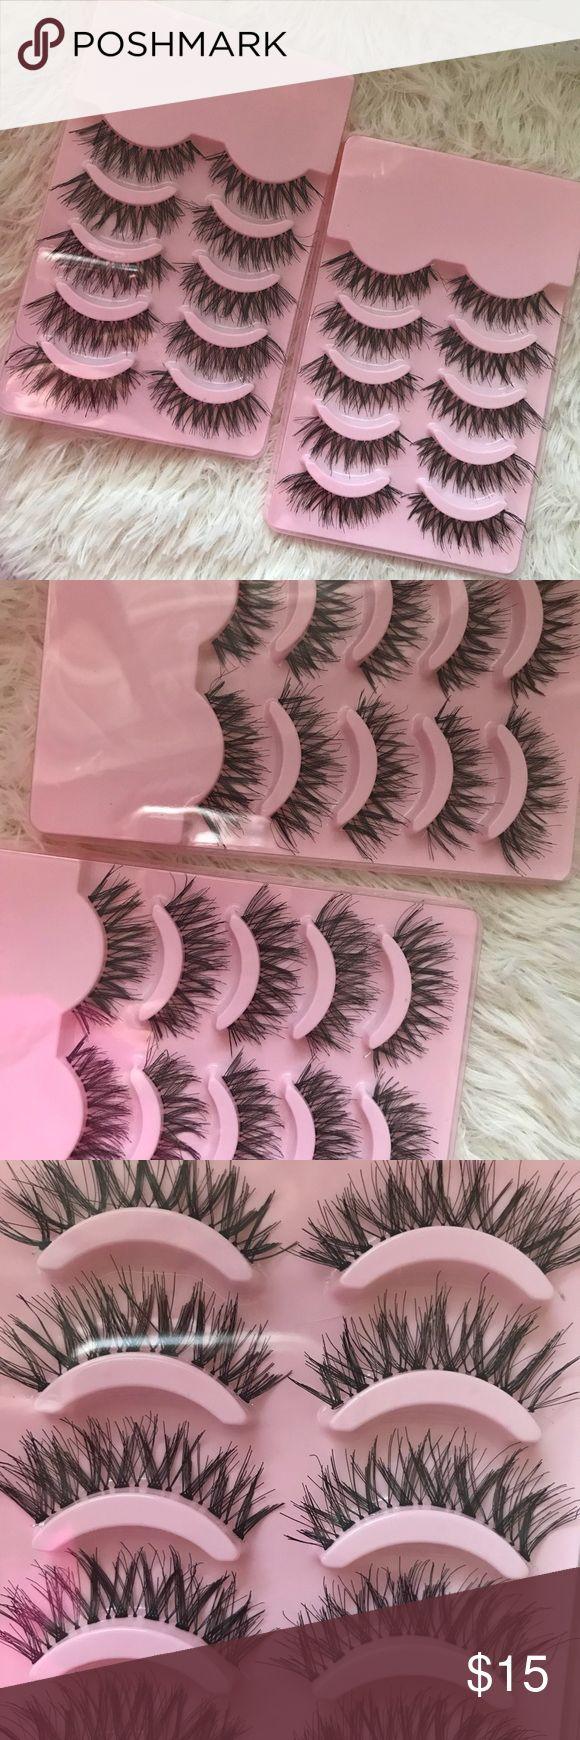 Wispy Lashes 10 Pairs BACK IN STOCK ❣️   # tags Iconic, mink, red cherry eyelashes, house of lashes, doll, kawaii, case, full, natural,  Koko, Ardell, wispies, Demi , makeup, mascara, eyelash applicator, tweezer  +$2 eyelash Applicator  +$3 eyelash glue Makeup False Eyelashes